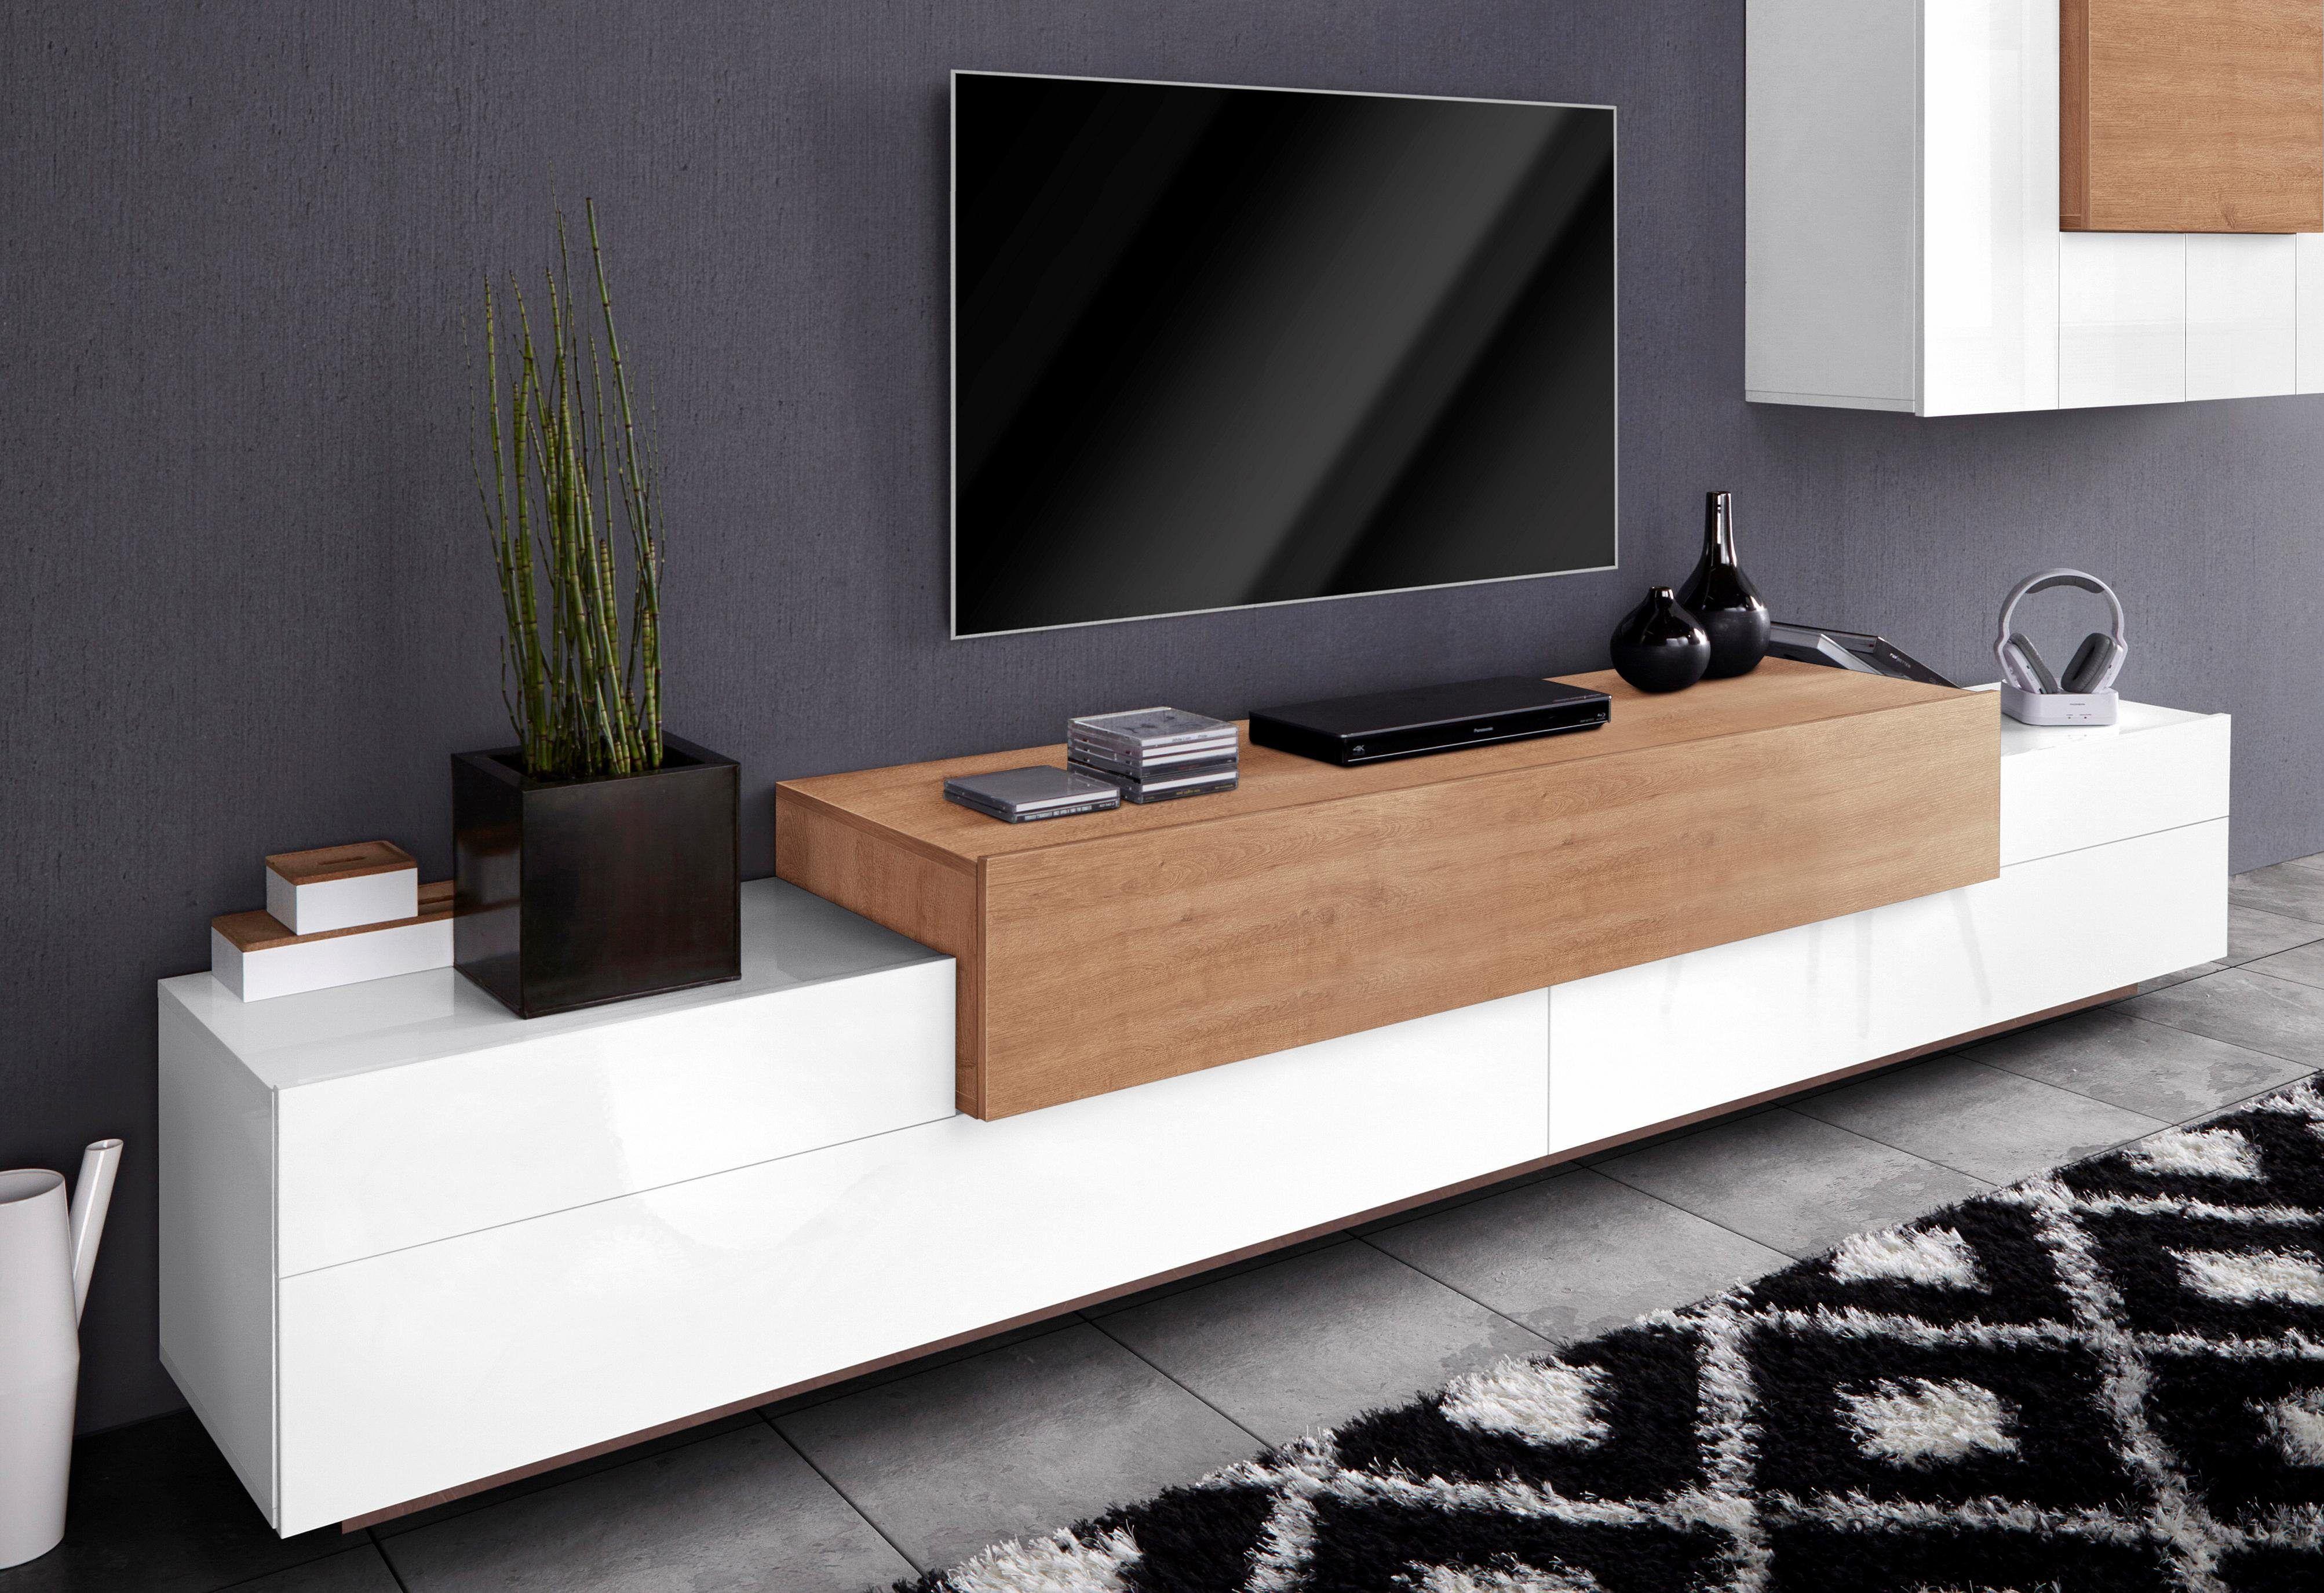 Wohnzimmer Hochglanz ~ Tecnos lowboard »asia« weiß hochglanz fronten fsc® zertifiziert